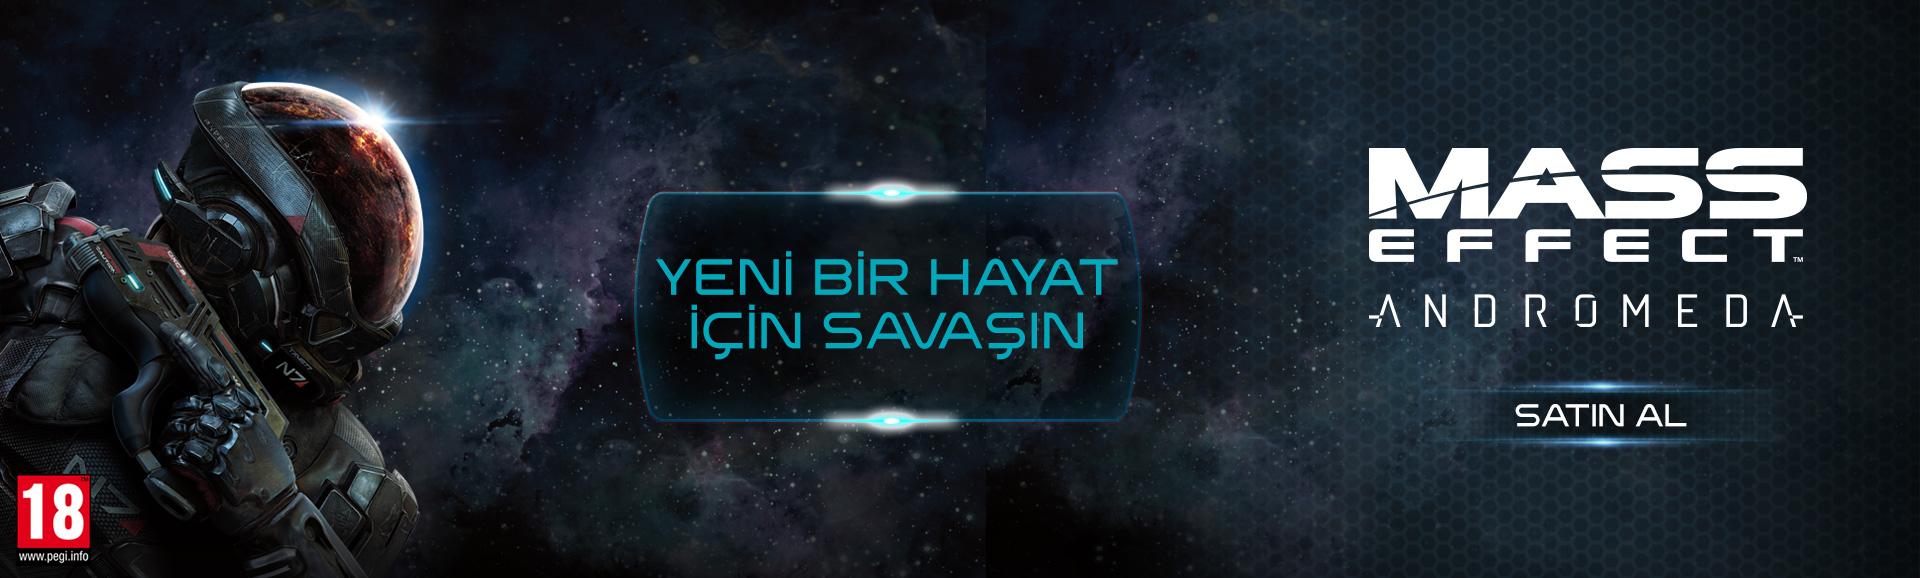 Mass Effect Andromeda - Satışta!